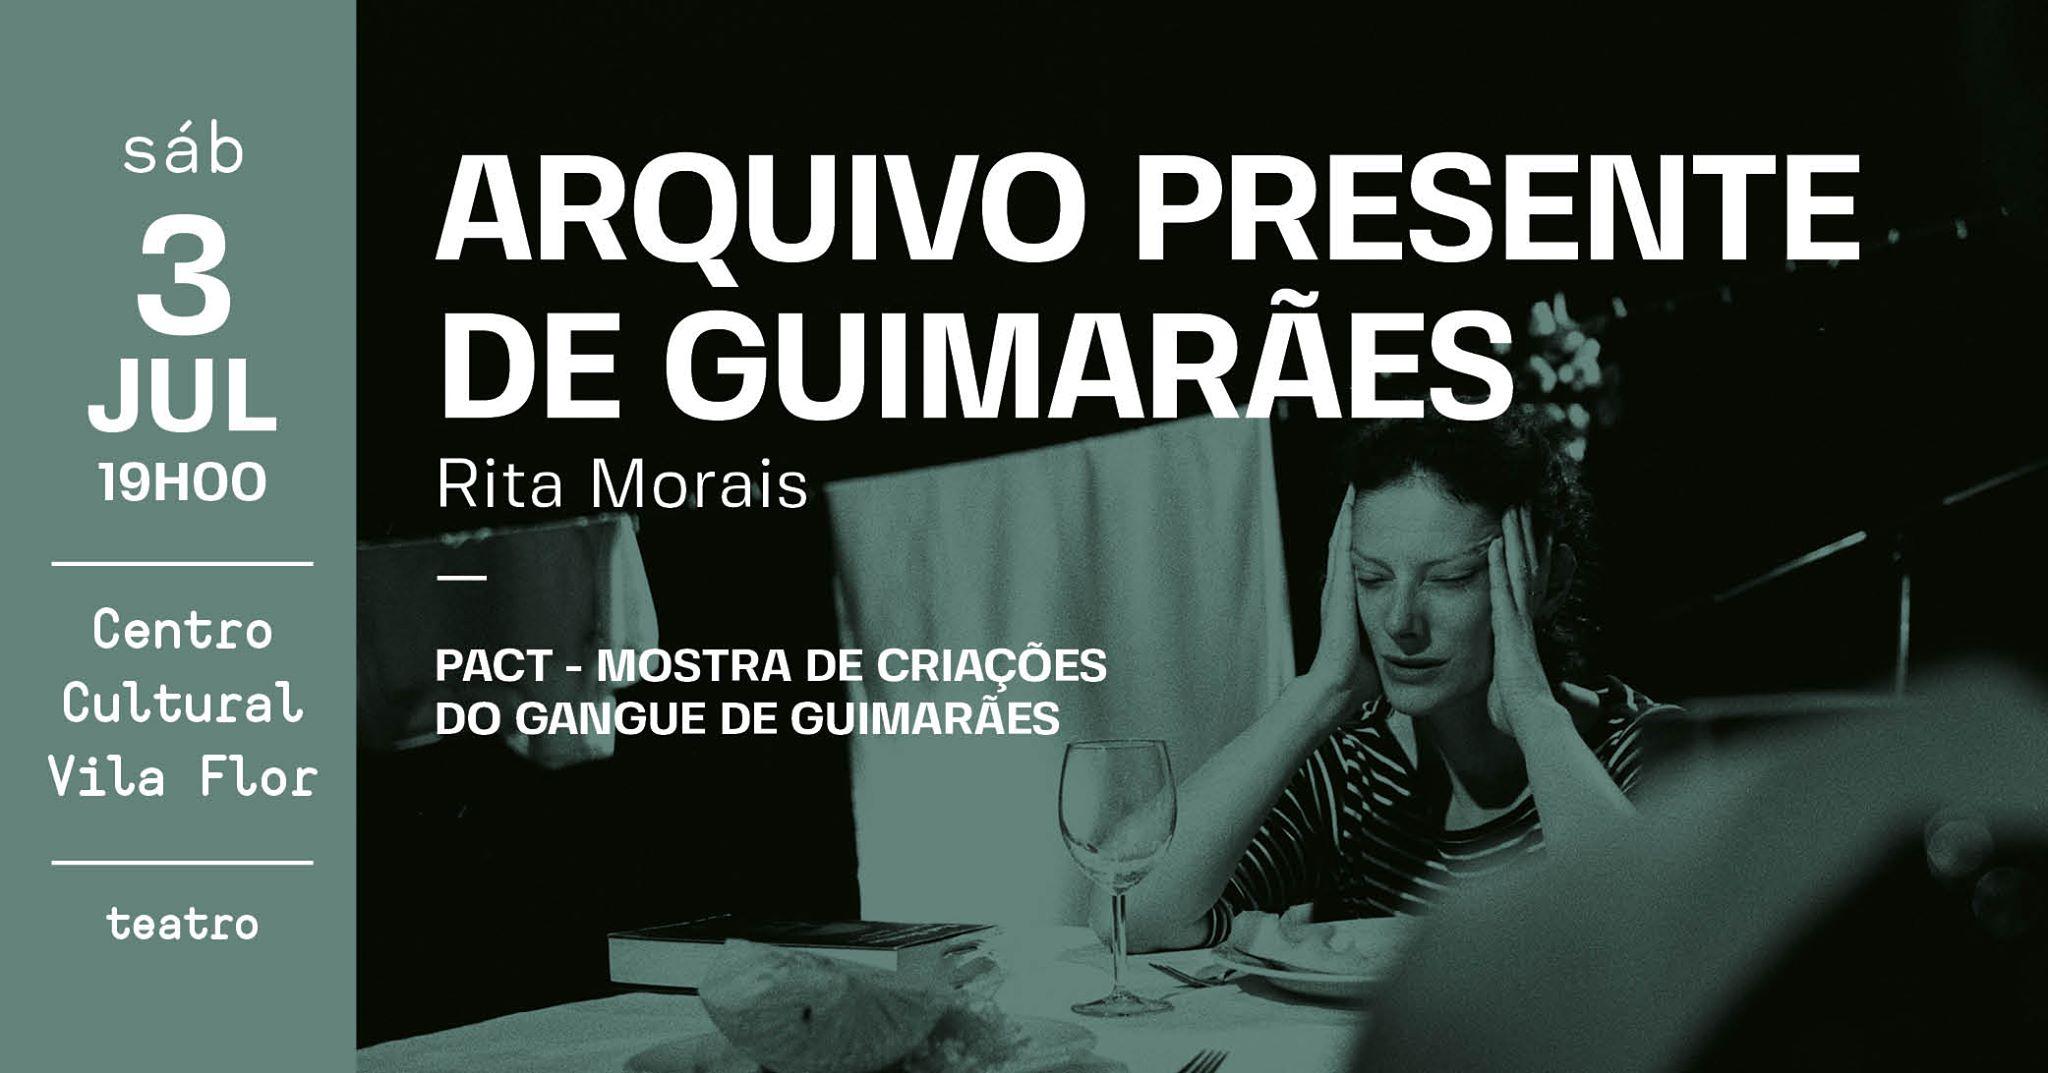 Arquivo Presente de Guimarães • Rita Morais